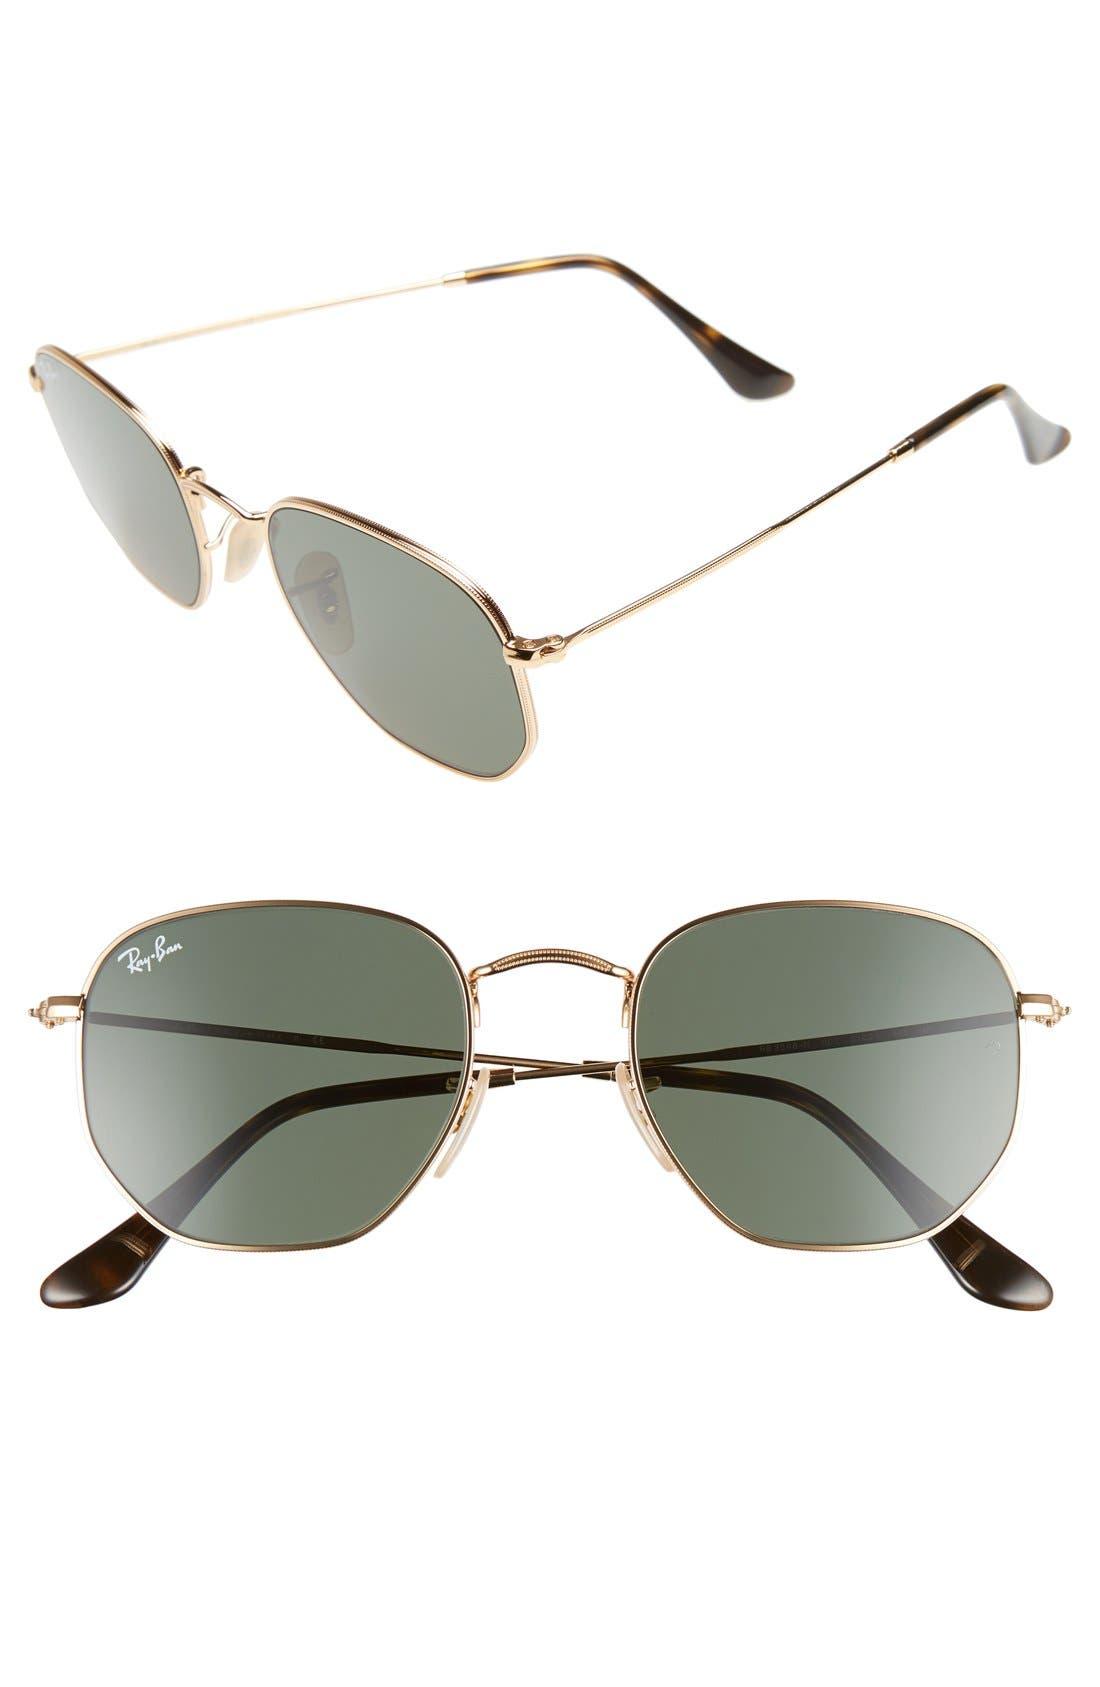 Main Image - Ray-Ban 51mm Hexagonal Flat Lens Sunglasses